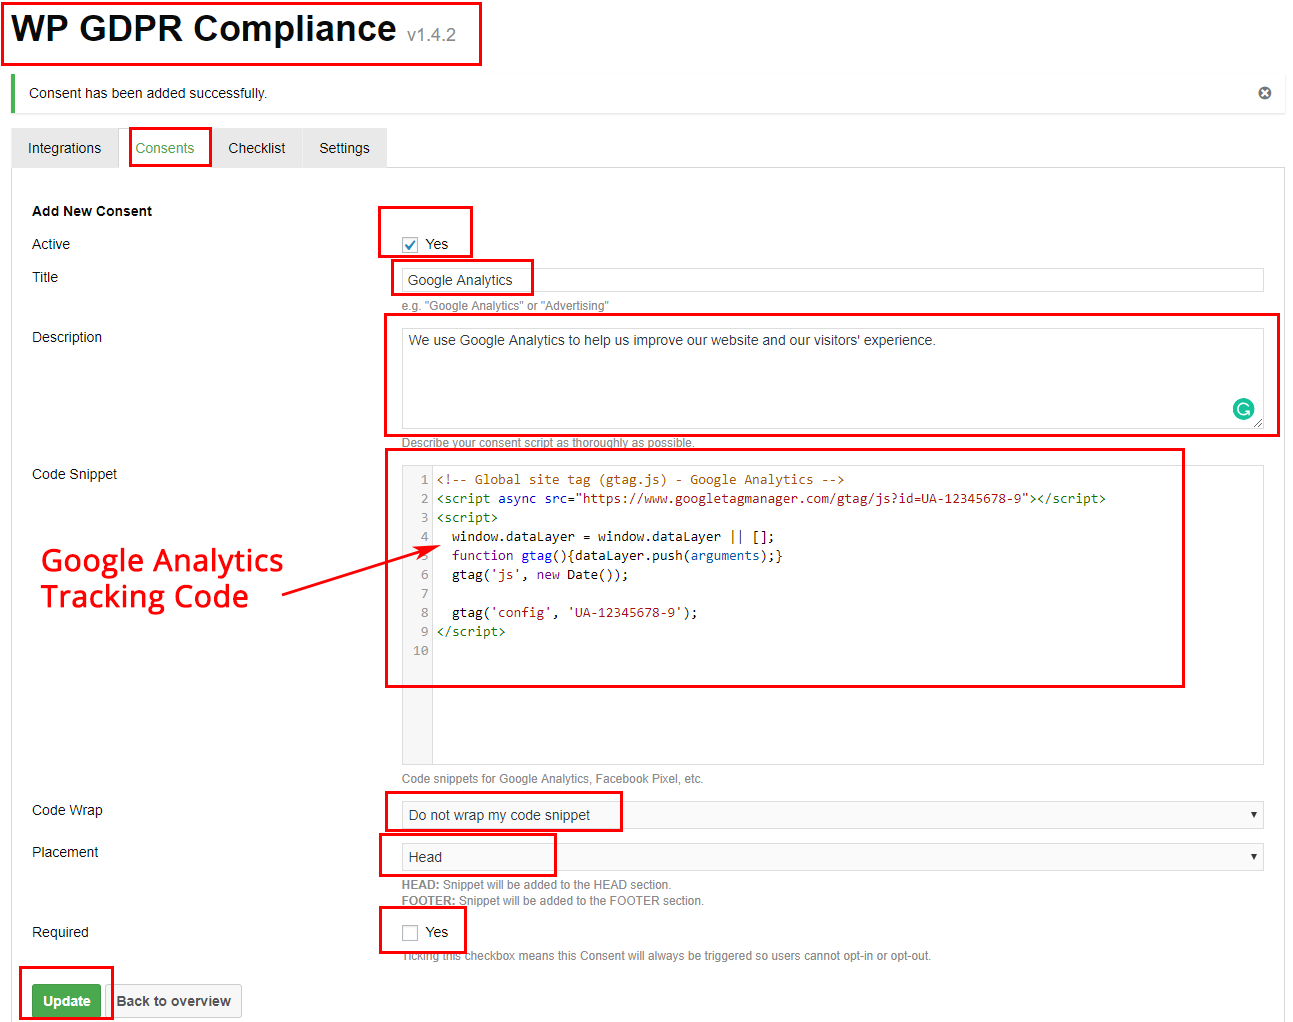 Wordpress Setup - WP GDPR Compliance and Google Analytics